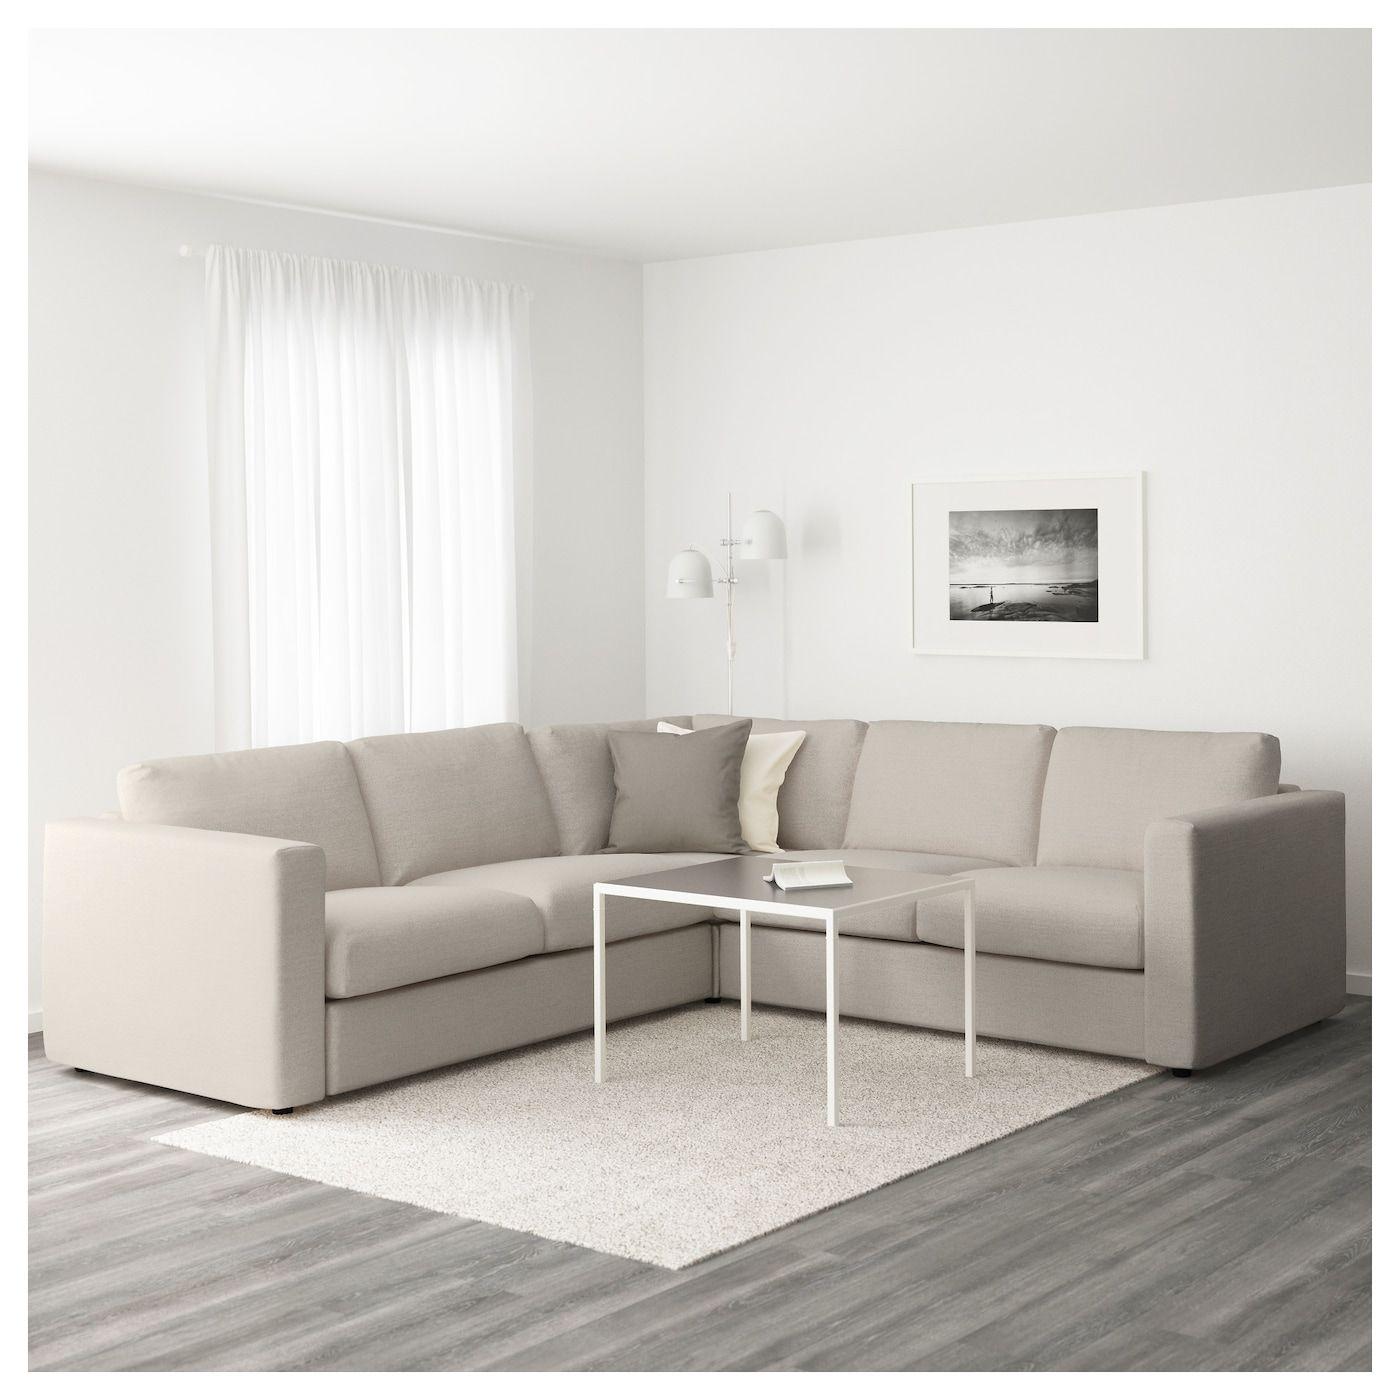 Ikea Us Furniture And Home Furnishings In 2020 Ecksofa Ikea Ecksofa Moderner Schnitt